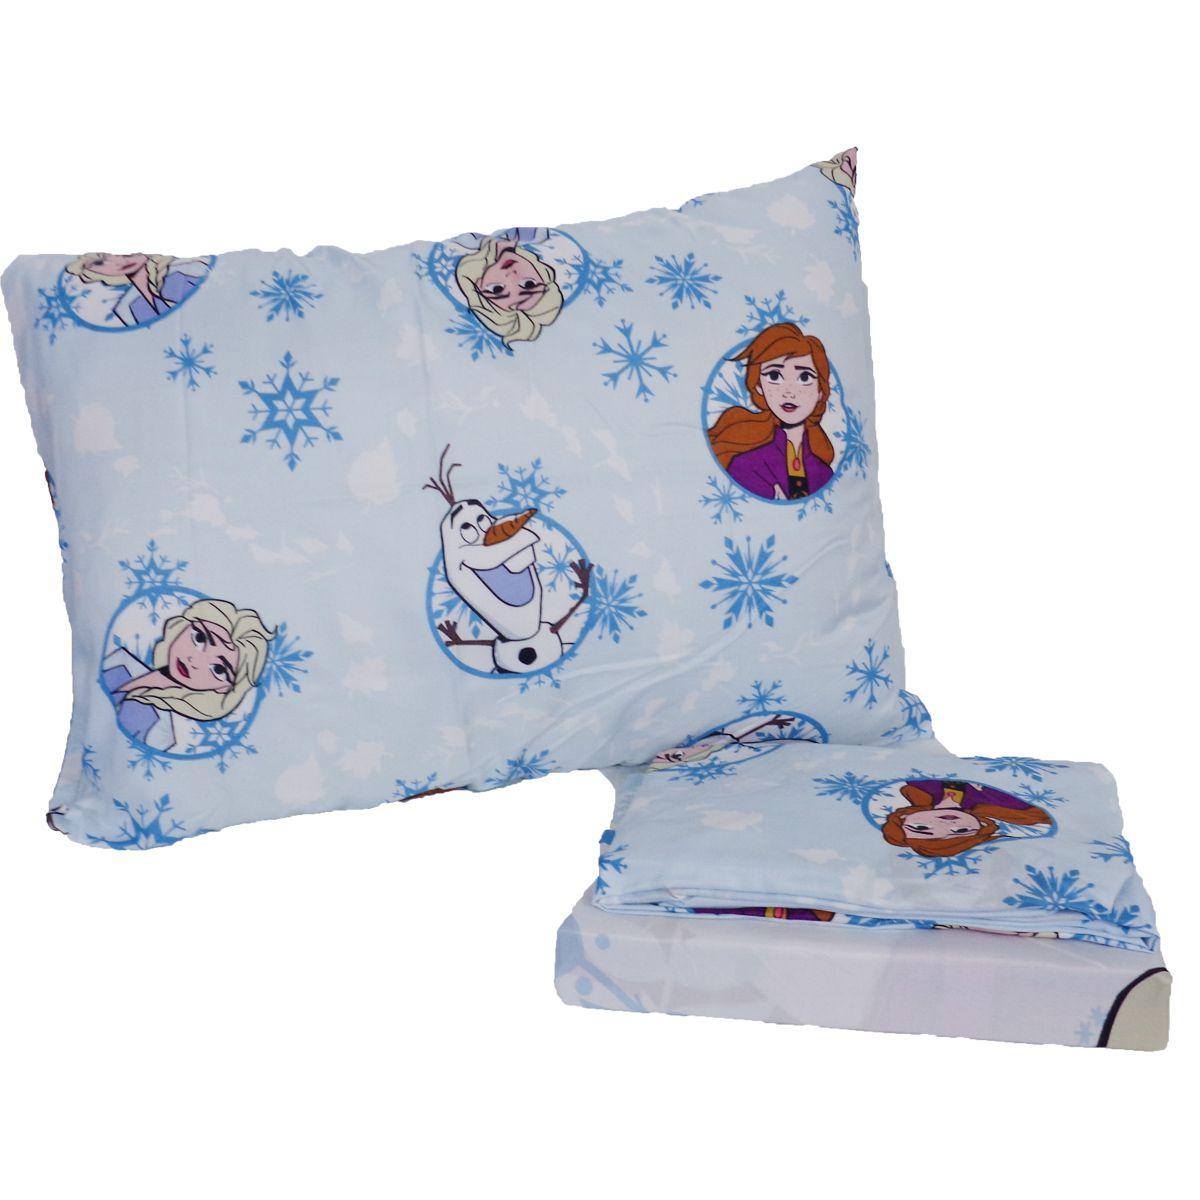 Kit Infantil Frozen Cortina + Jogo De Lençol 3 Peças Lepper